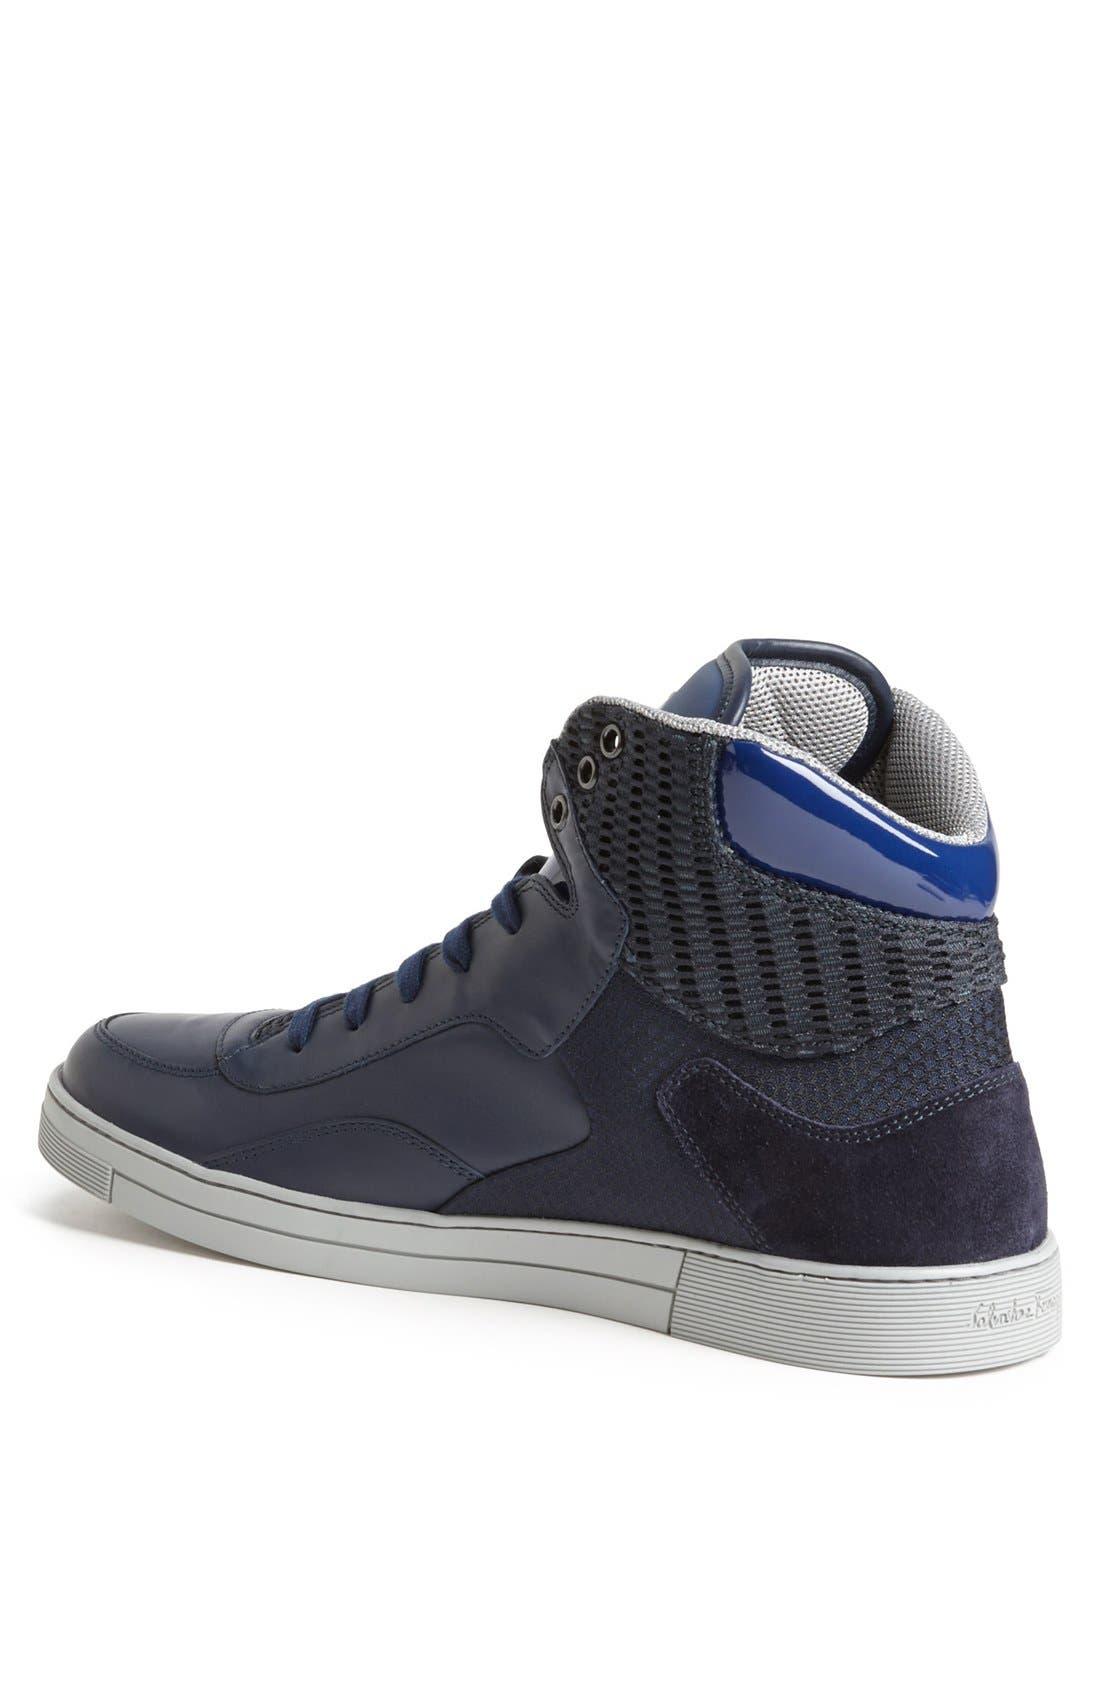 Alternate Image 2  - Salvatore Ferragamo 'Robert' High Top Sneaker